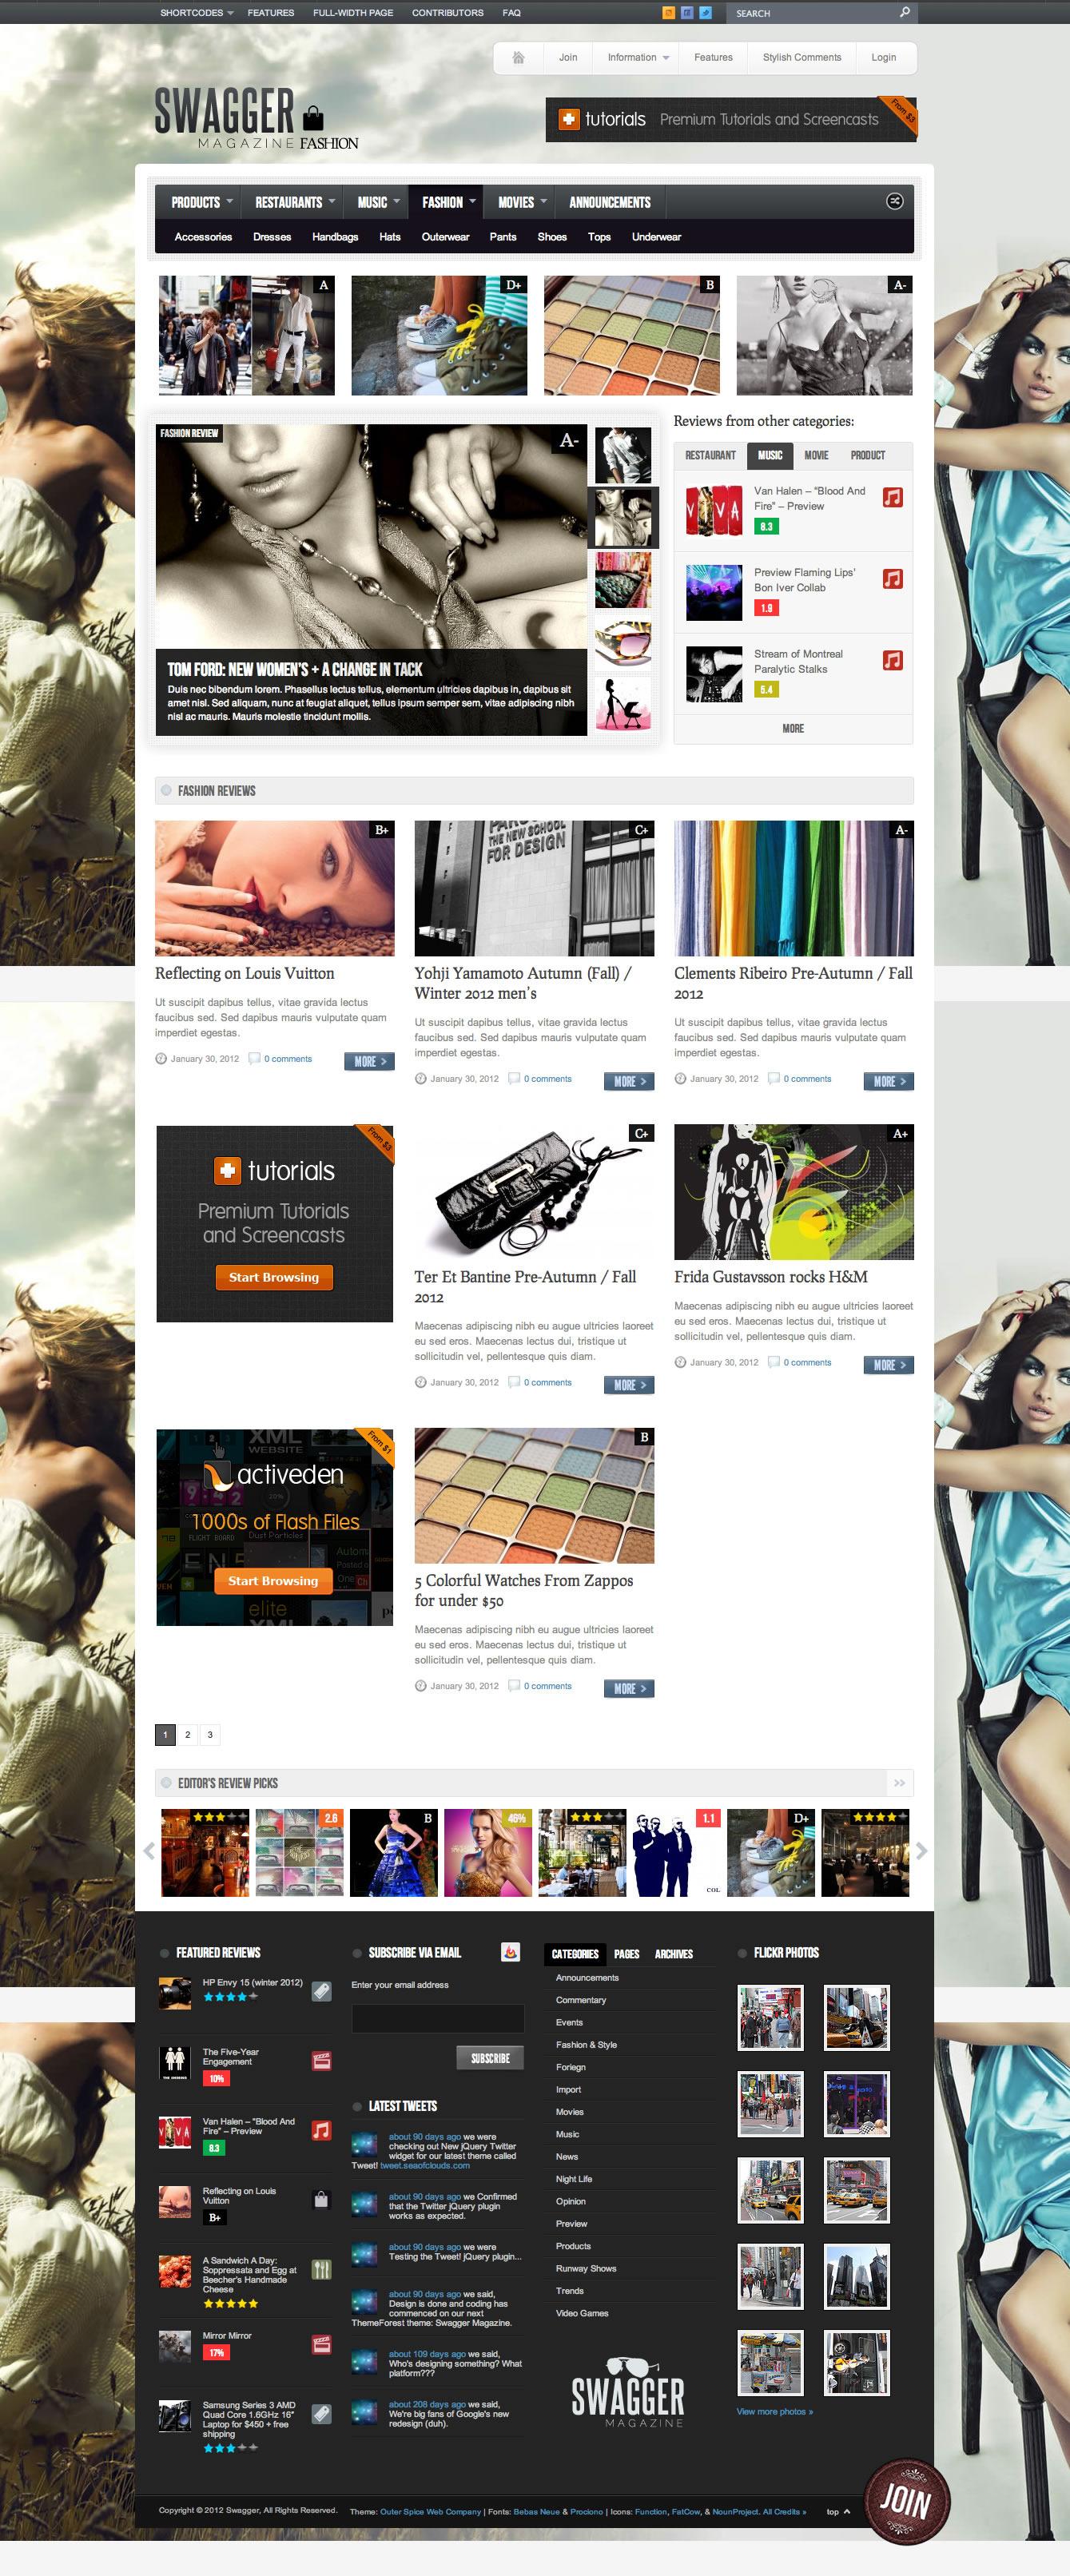 Color zen metacritic - Swagmag Wordpress Magazine Review Theme